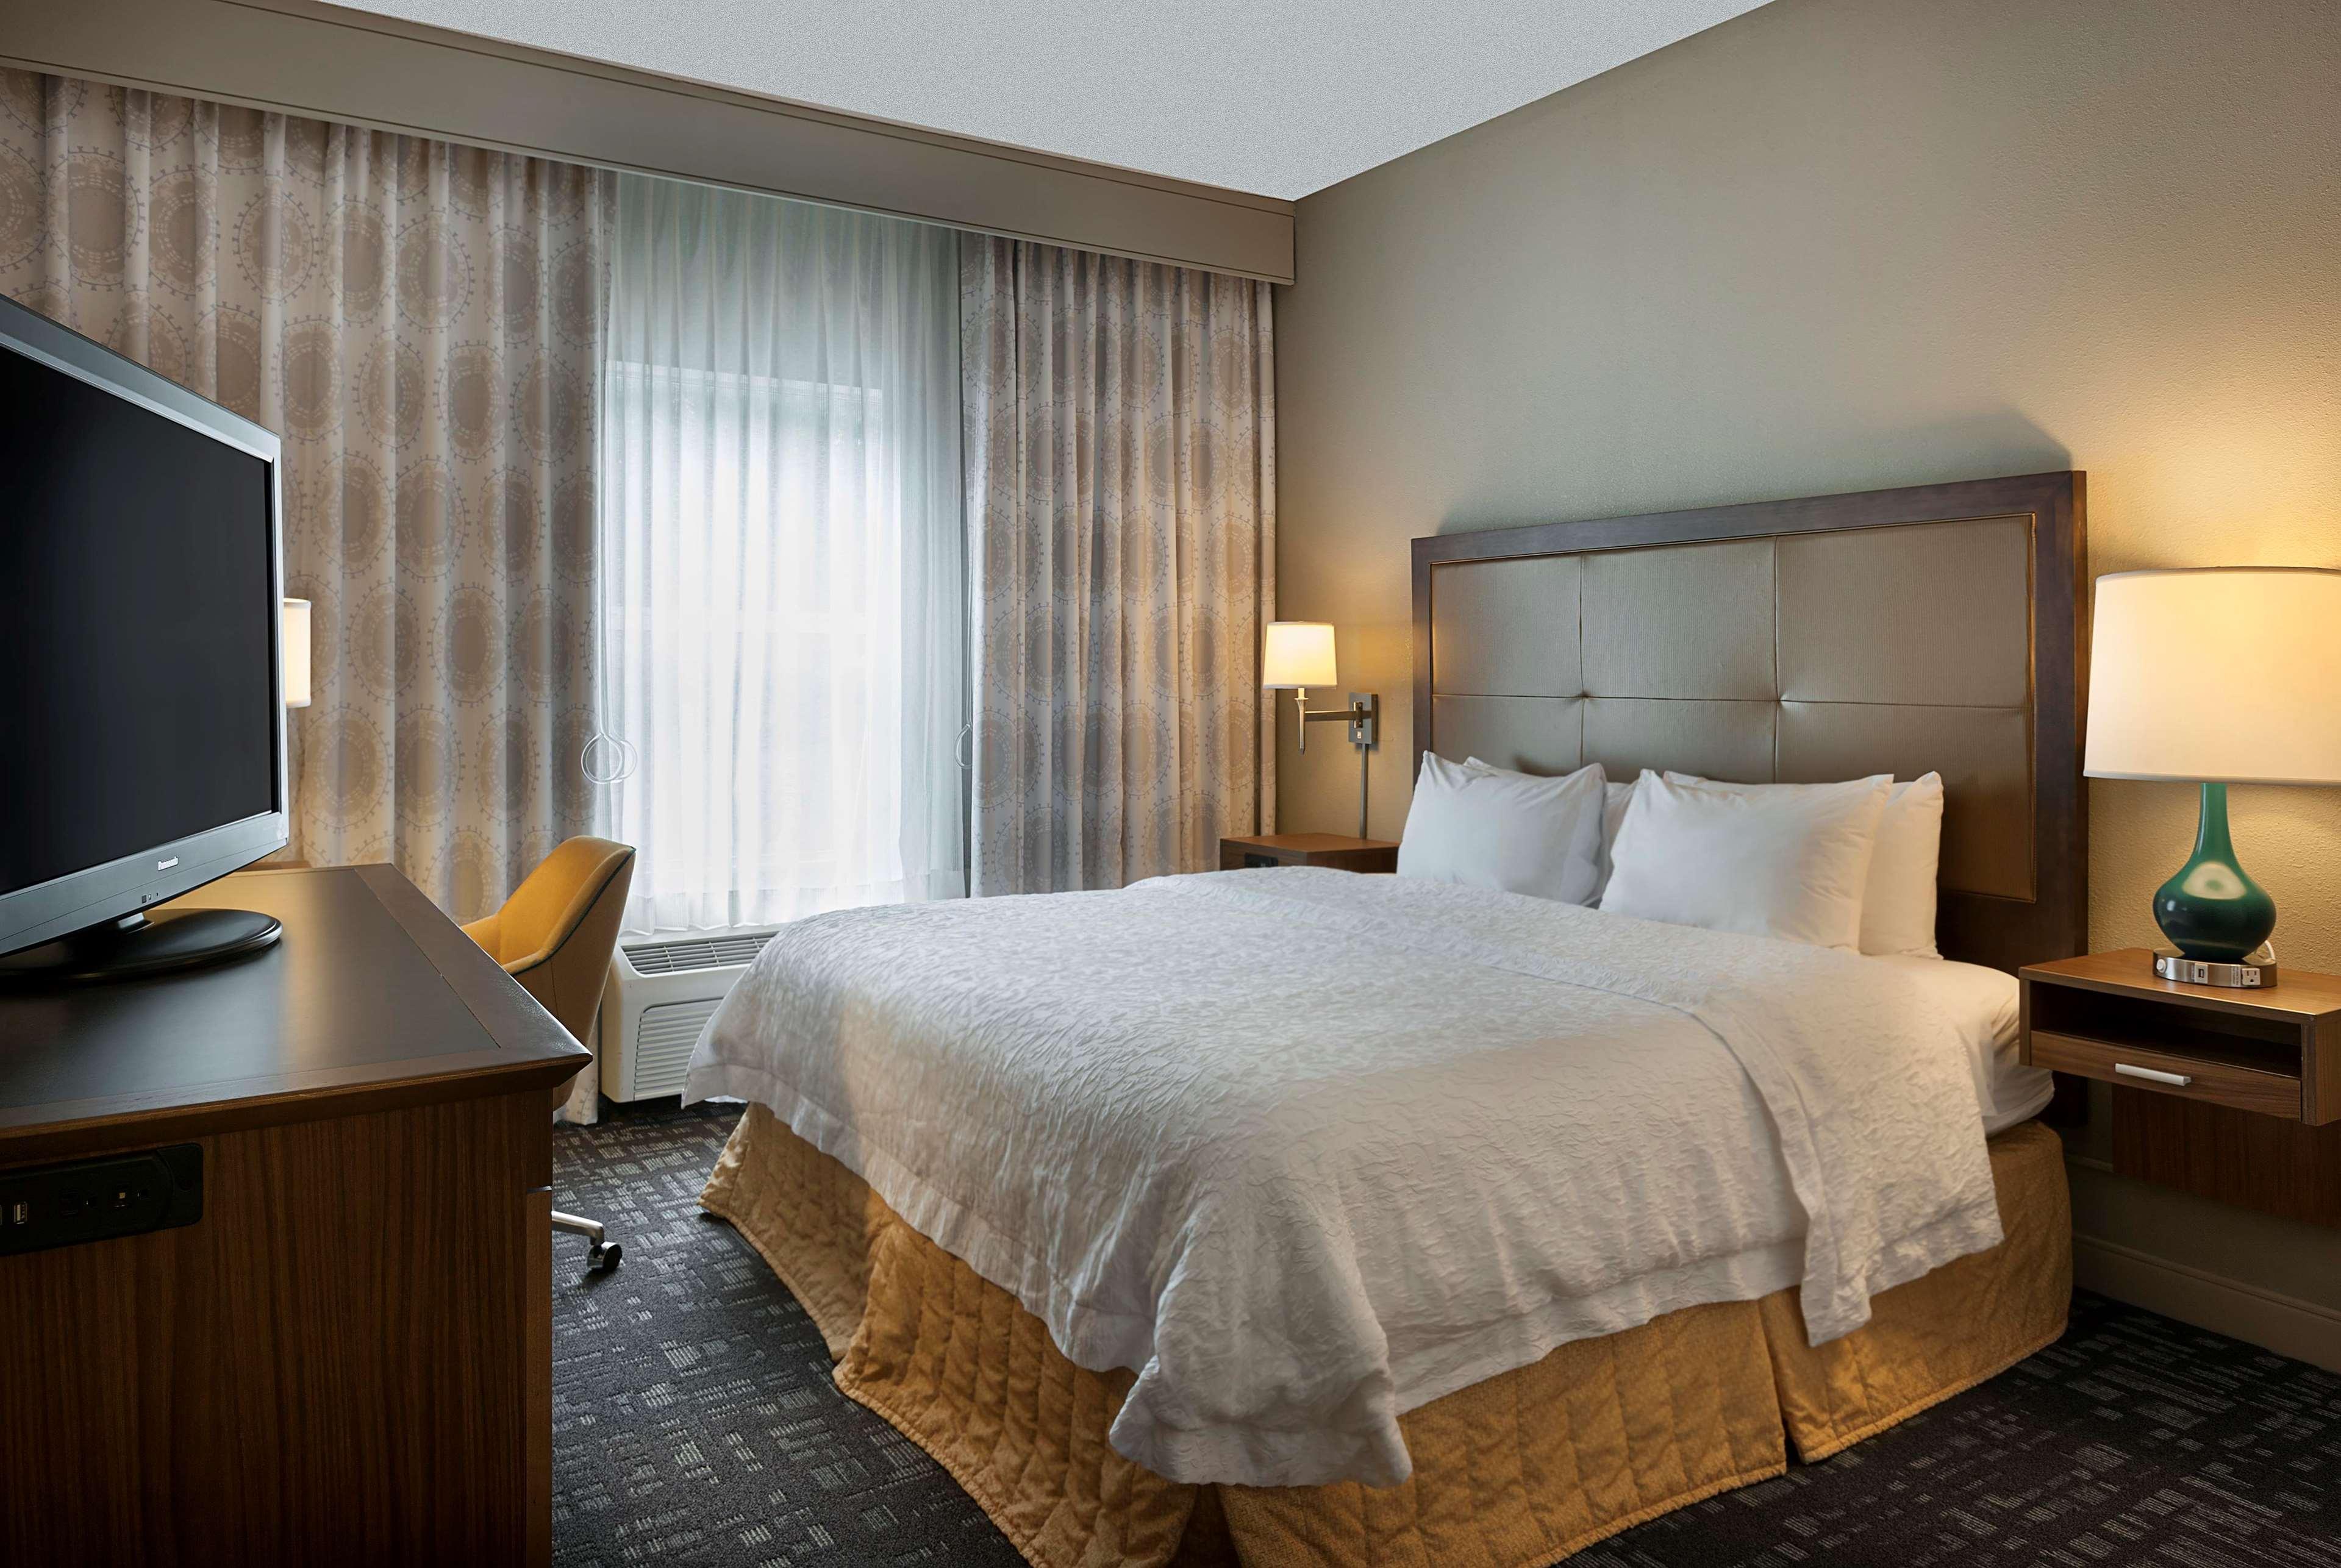 Hampton Inn & Suites Charlotte/Pineville image 24